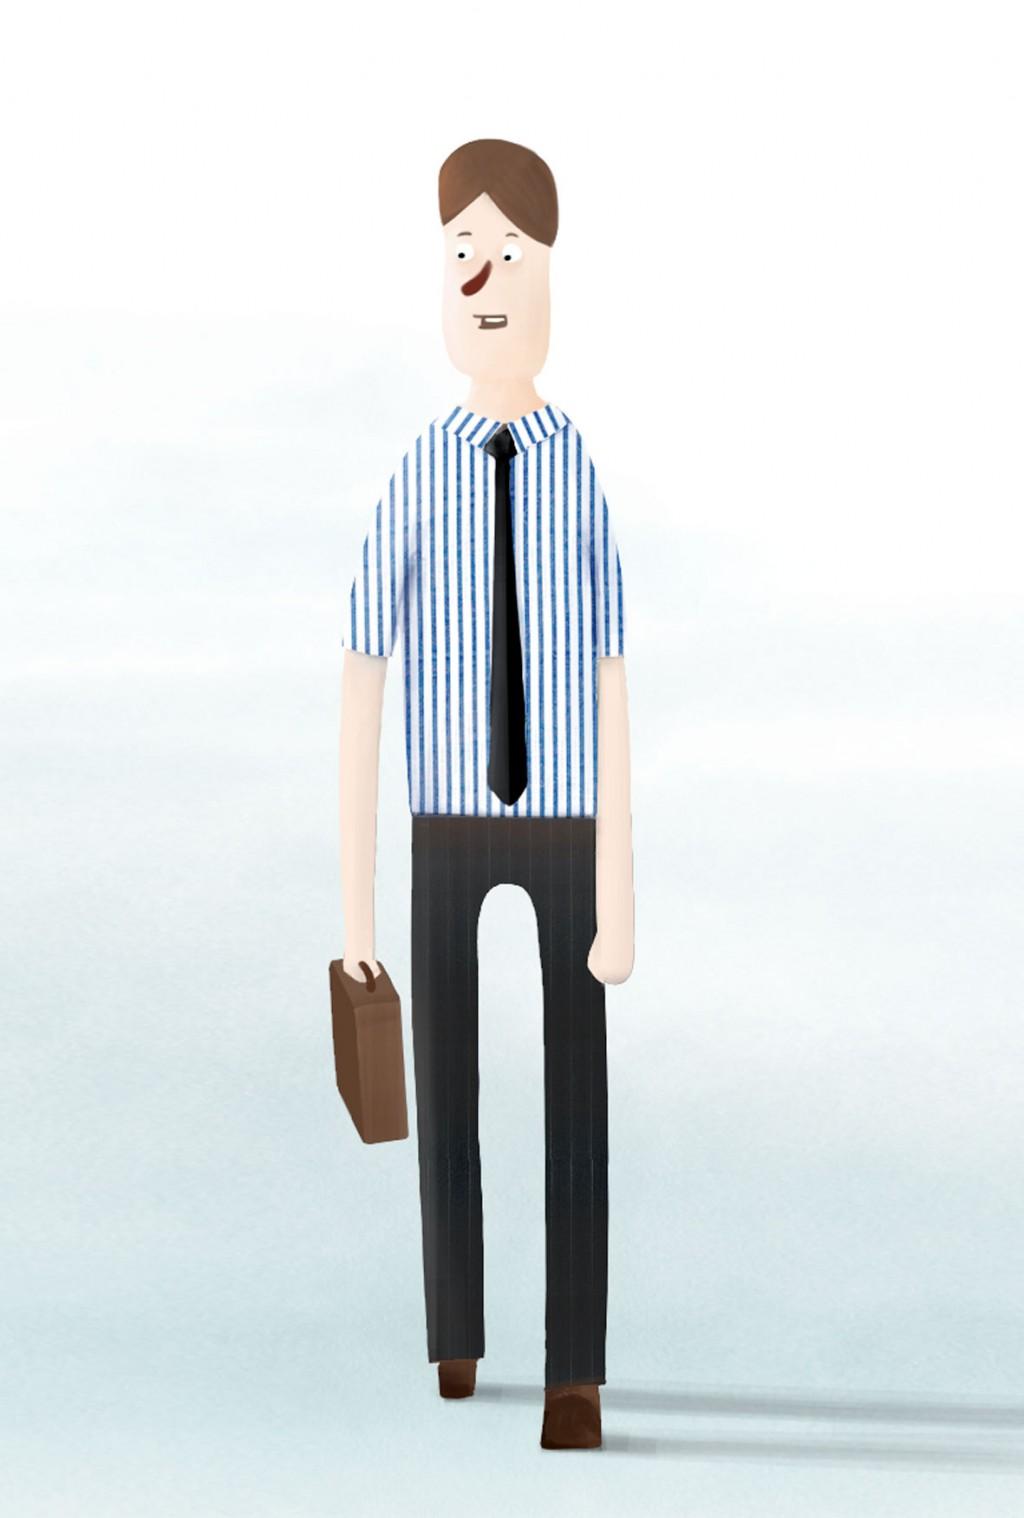 Jens Blank Kynect